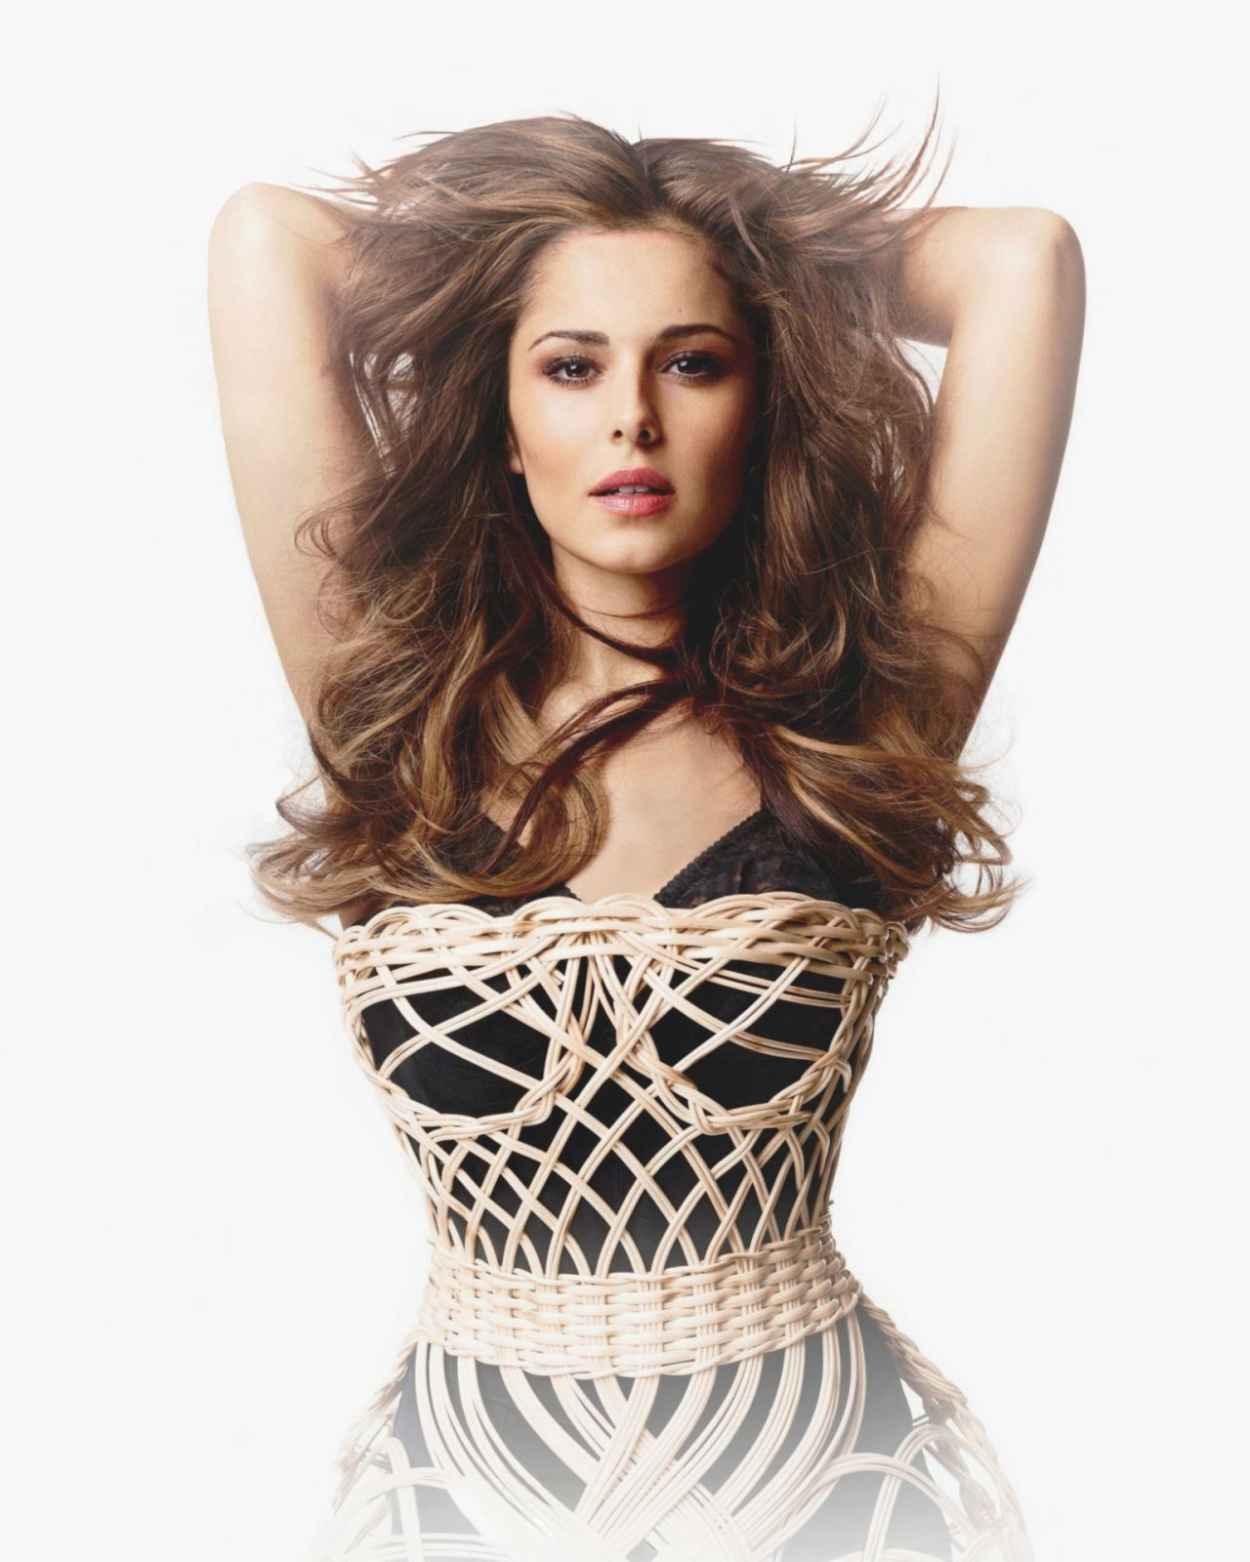 Cheryl Cole Photoshoot (David Vasiljevic)-1